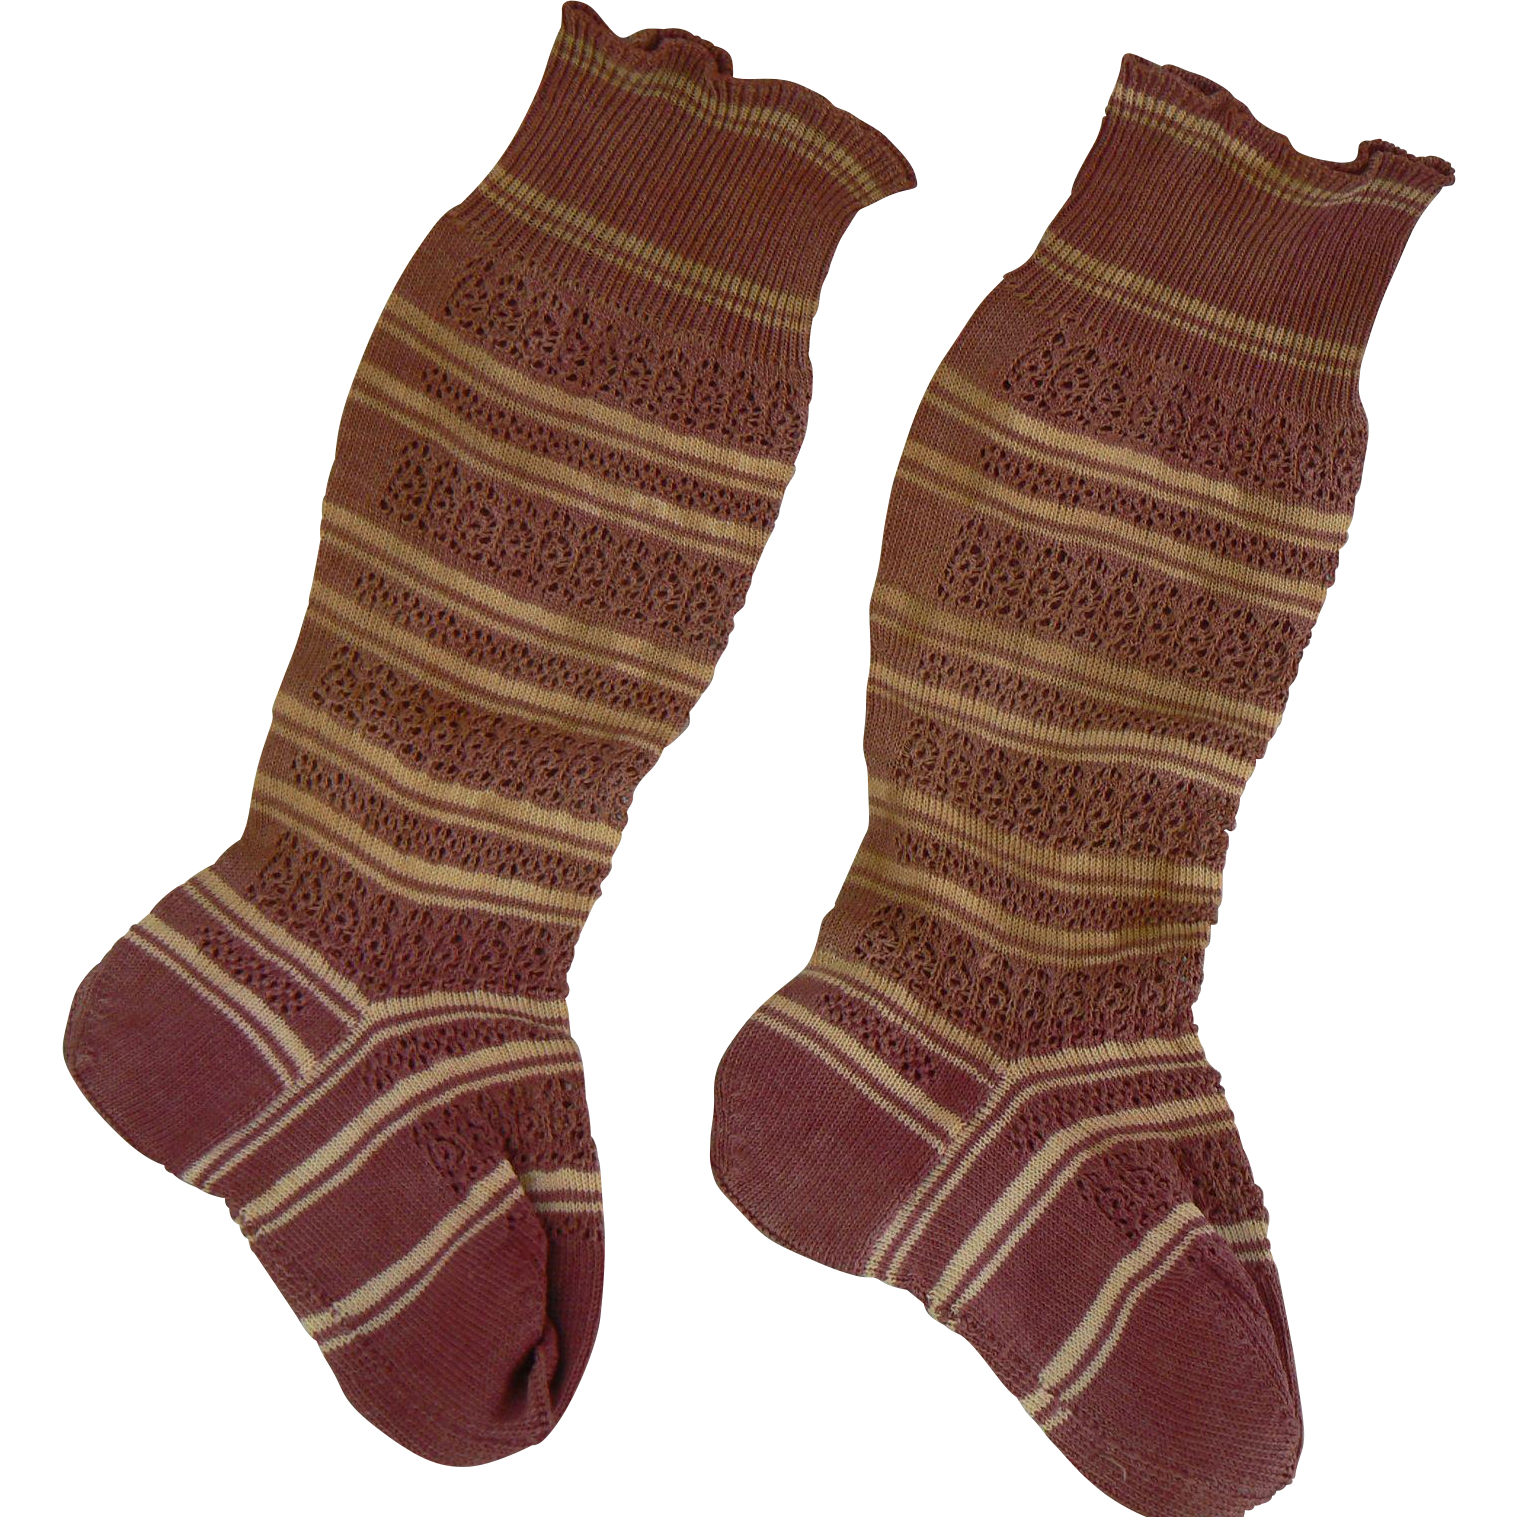 great socks